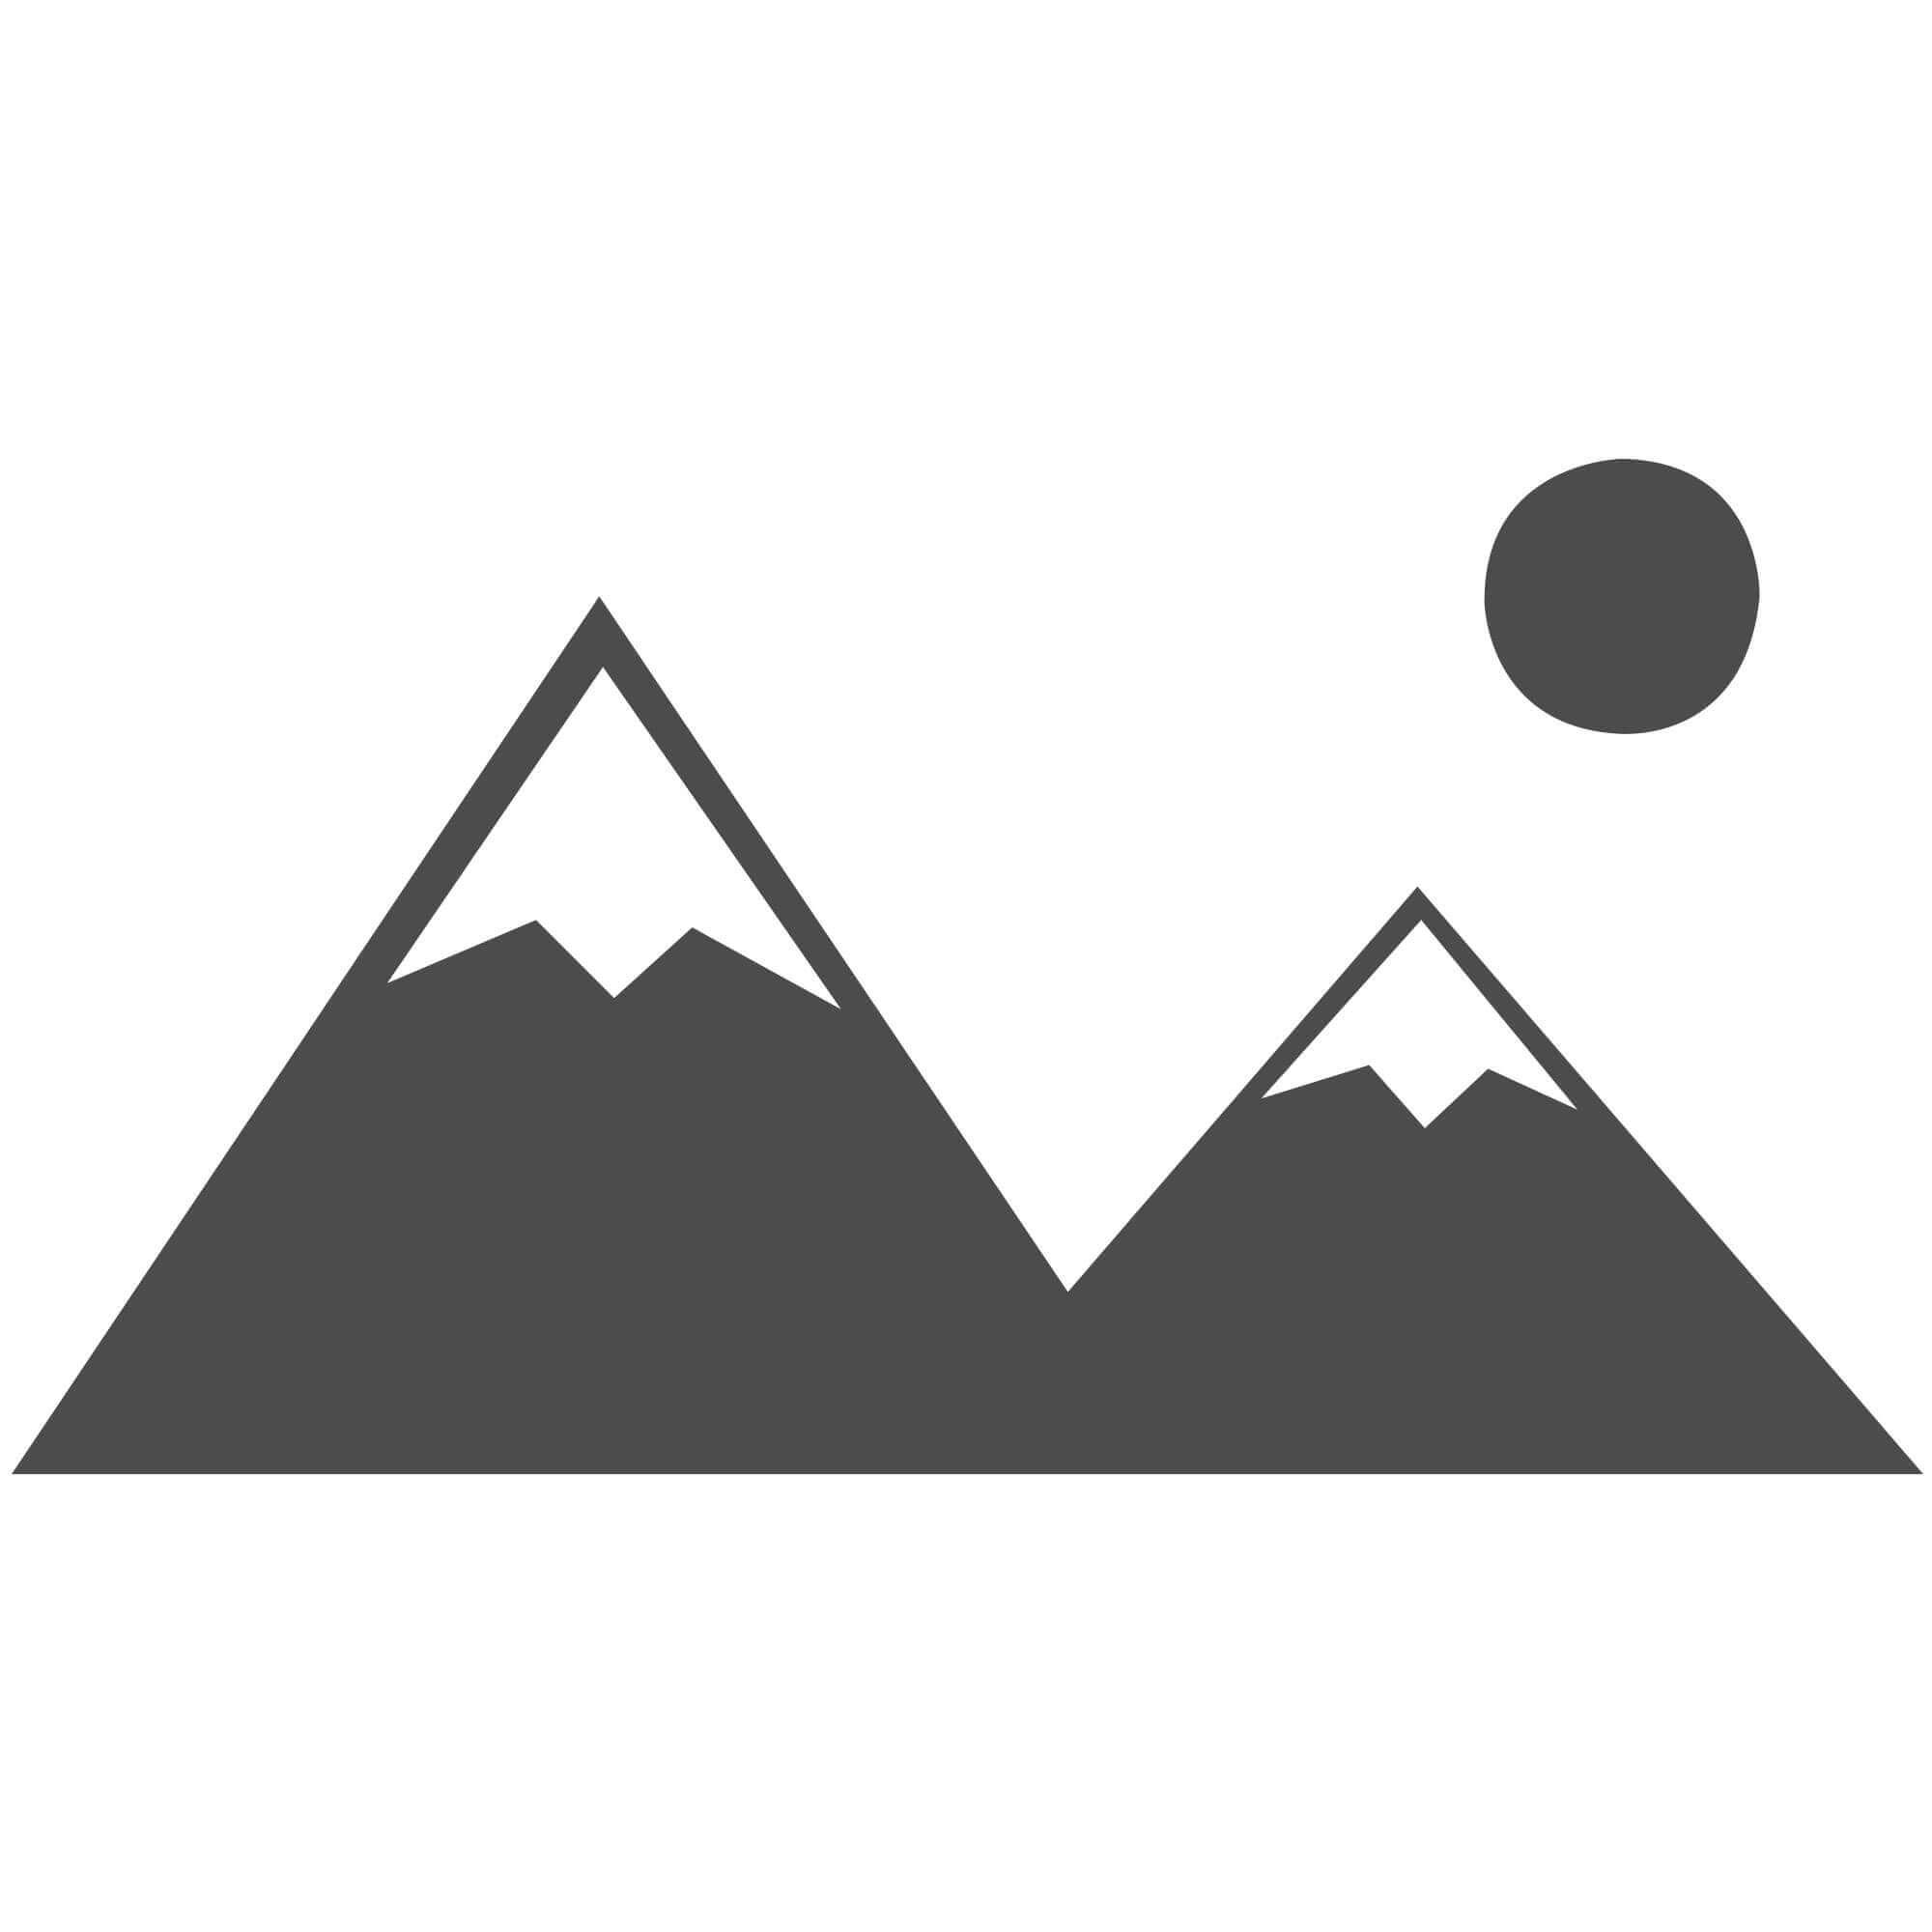 "New Vintage Yellow 8084 Rug by Louis de Poortere-Square 230 x 230 cm (7'7"" x 7'7"")"